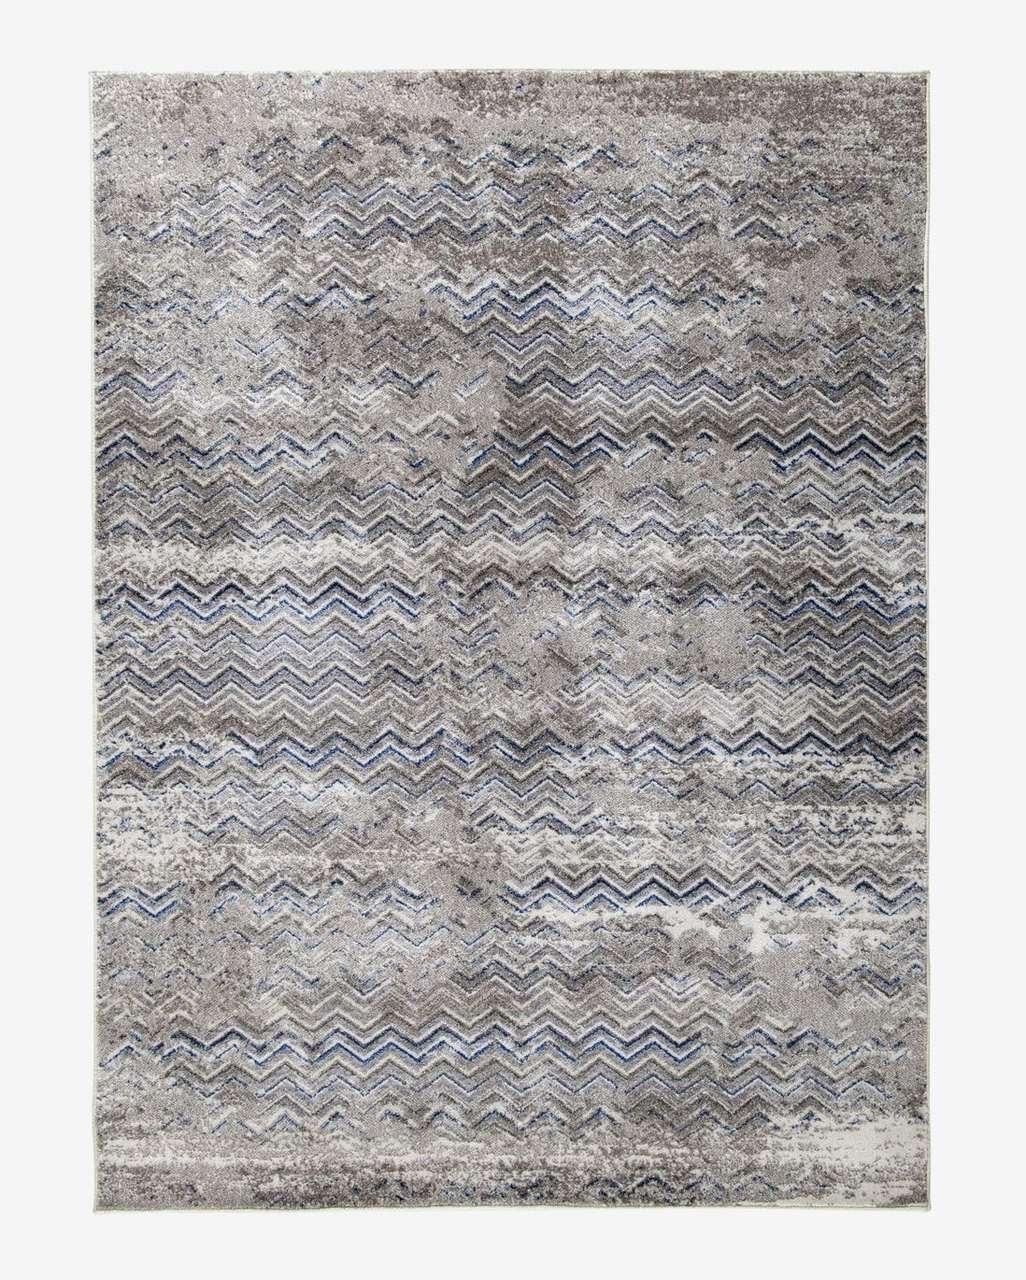 Tapete Evora 200 x 250 cm 3/A